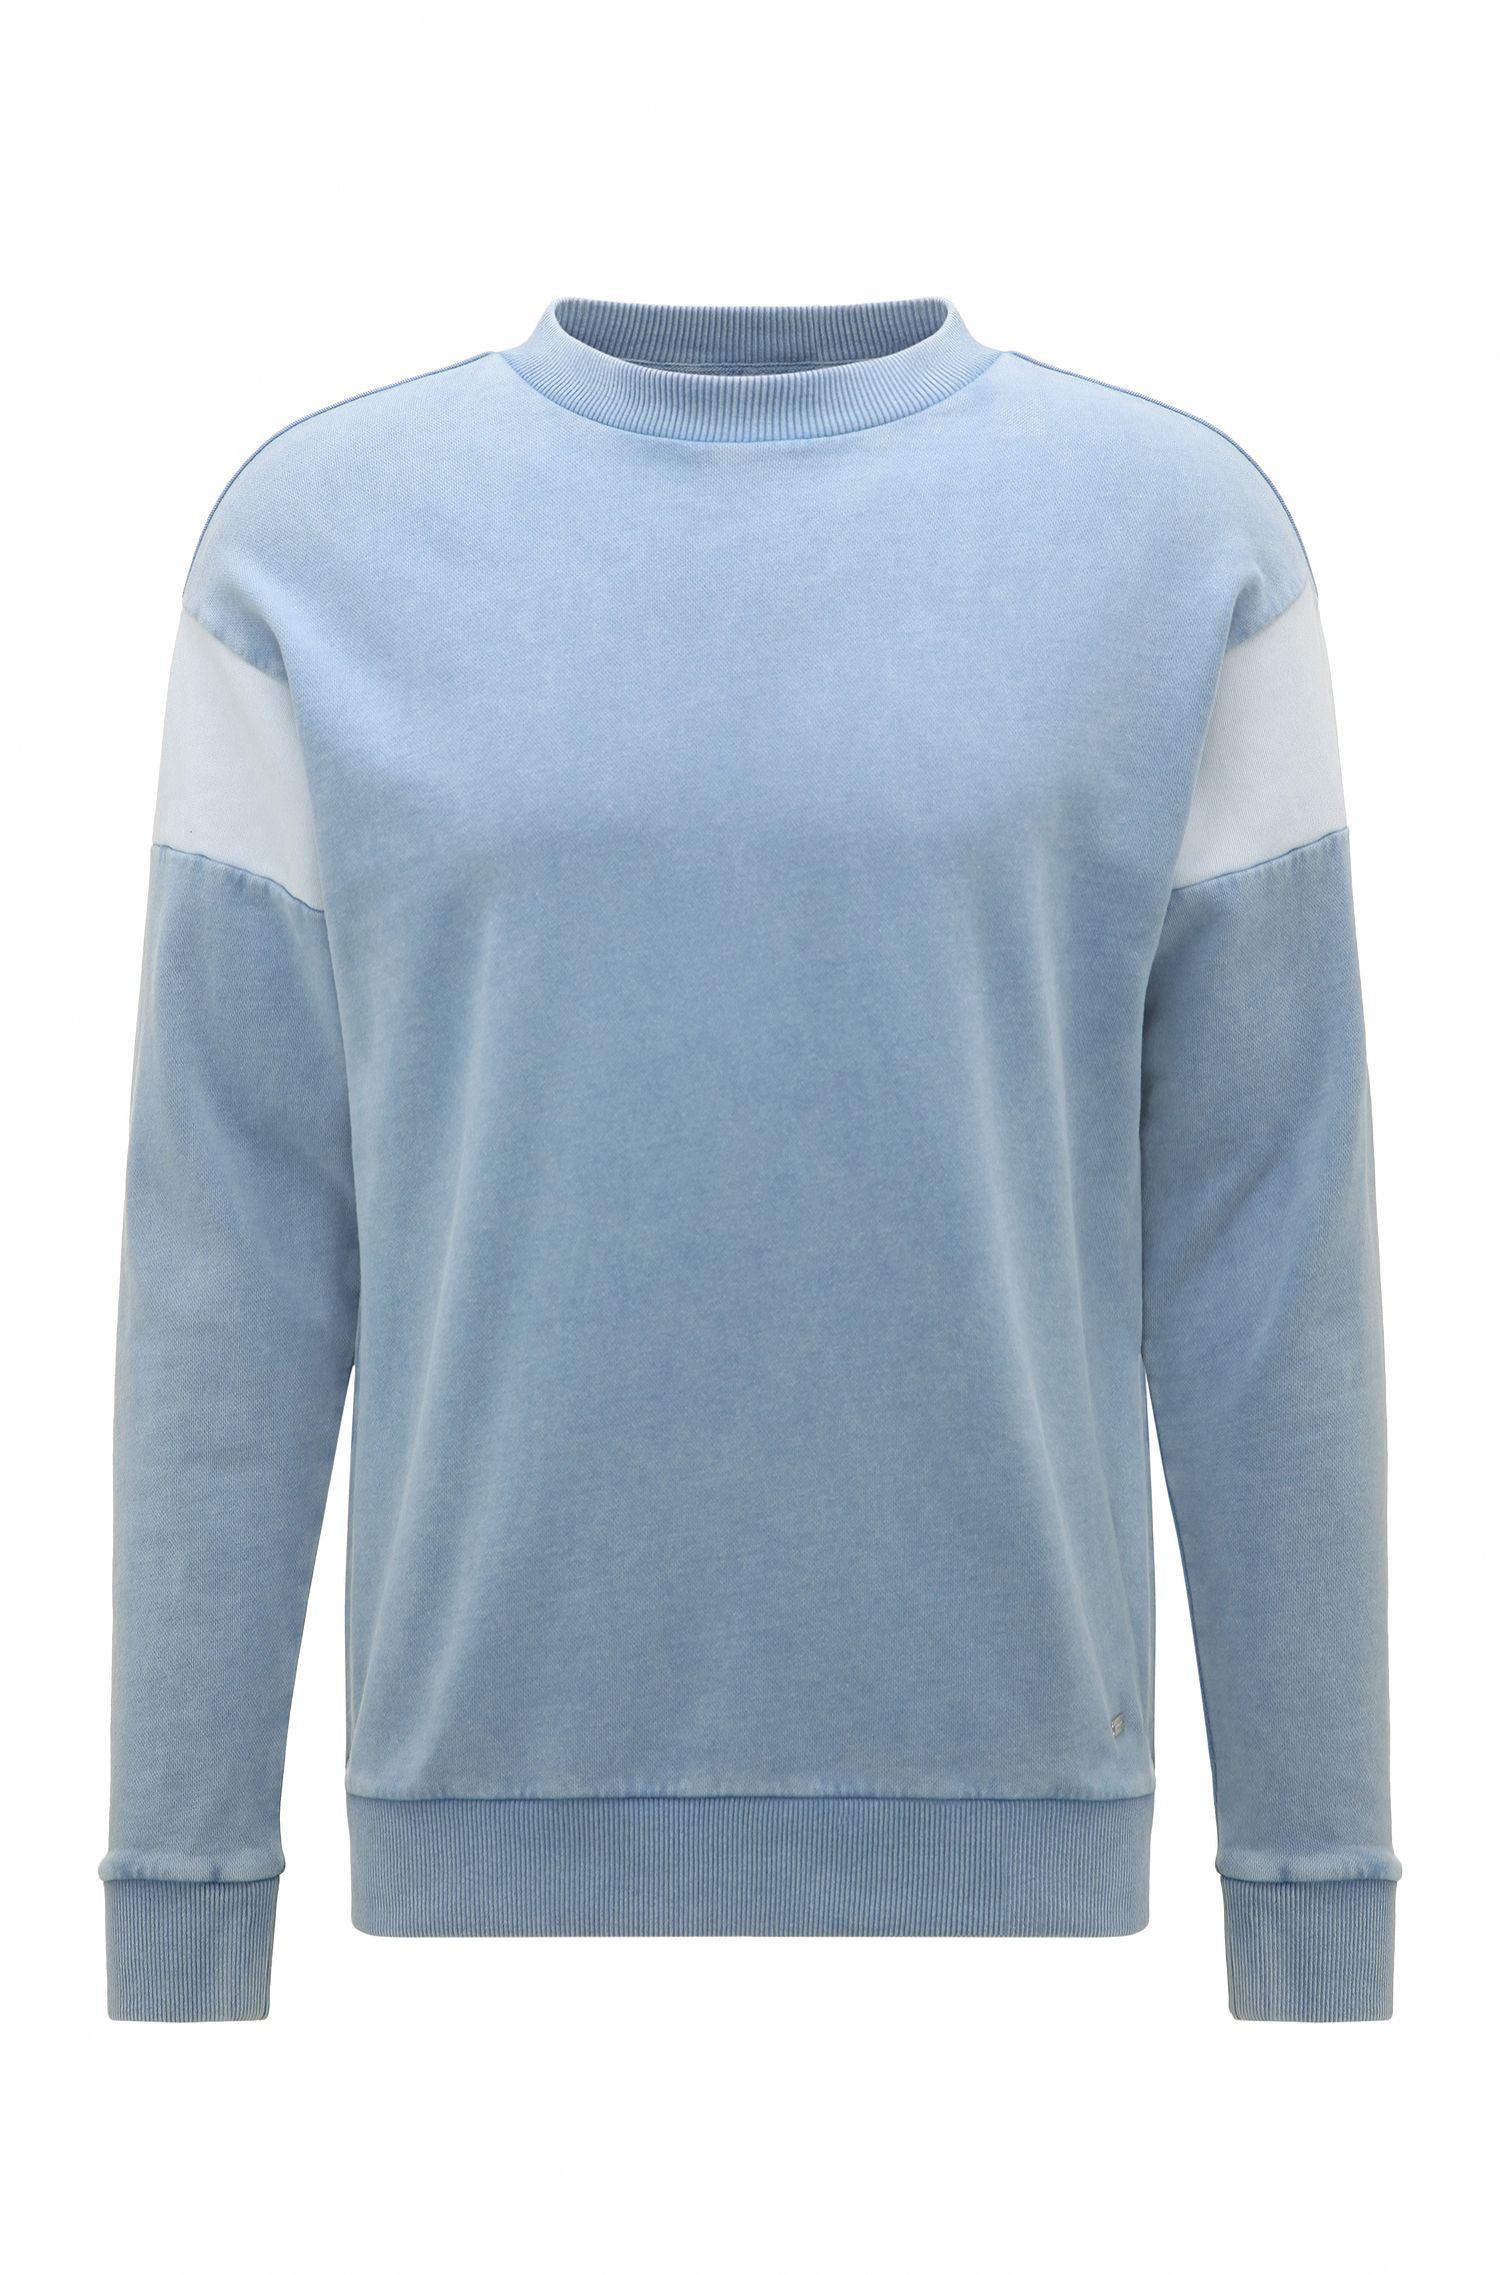 Regular-fit sweatshirt van katoen in washed out-look: 'Wham'